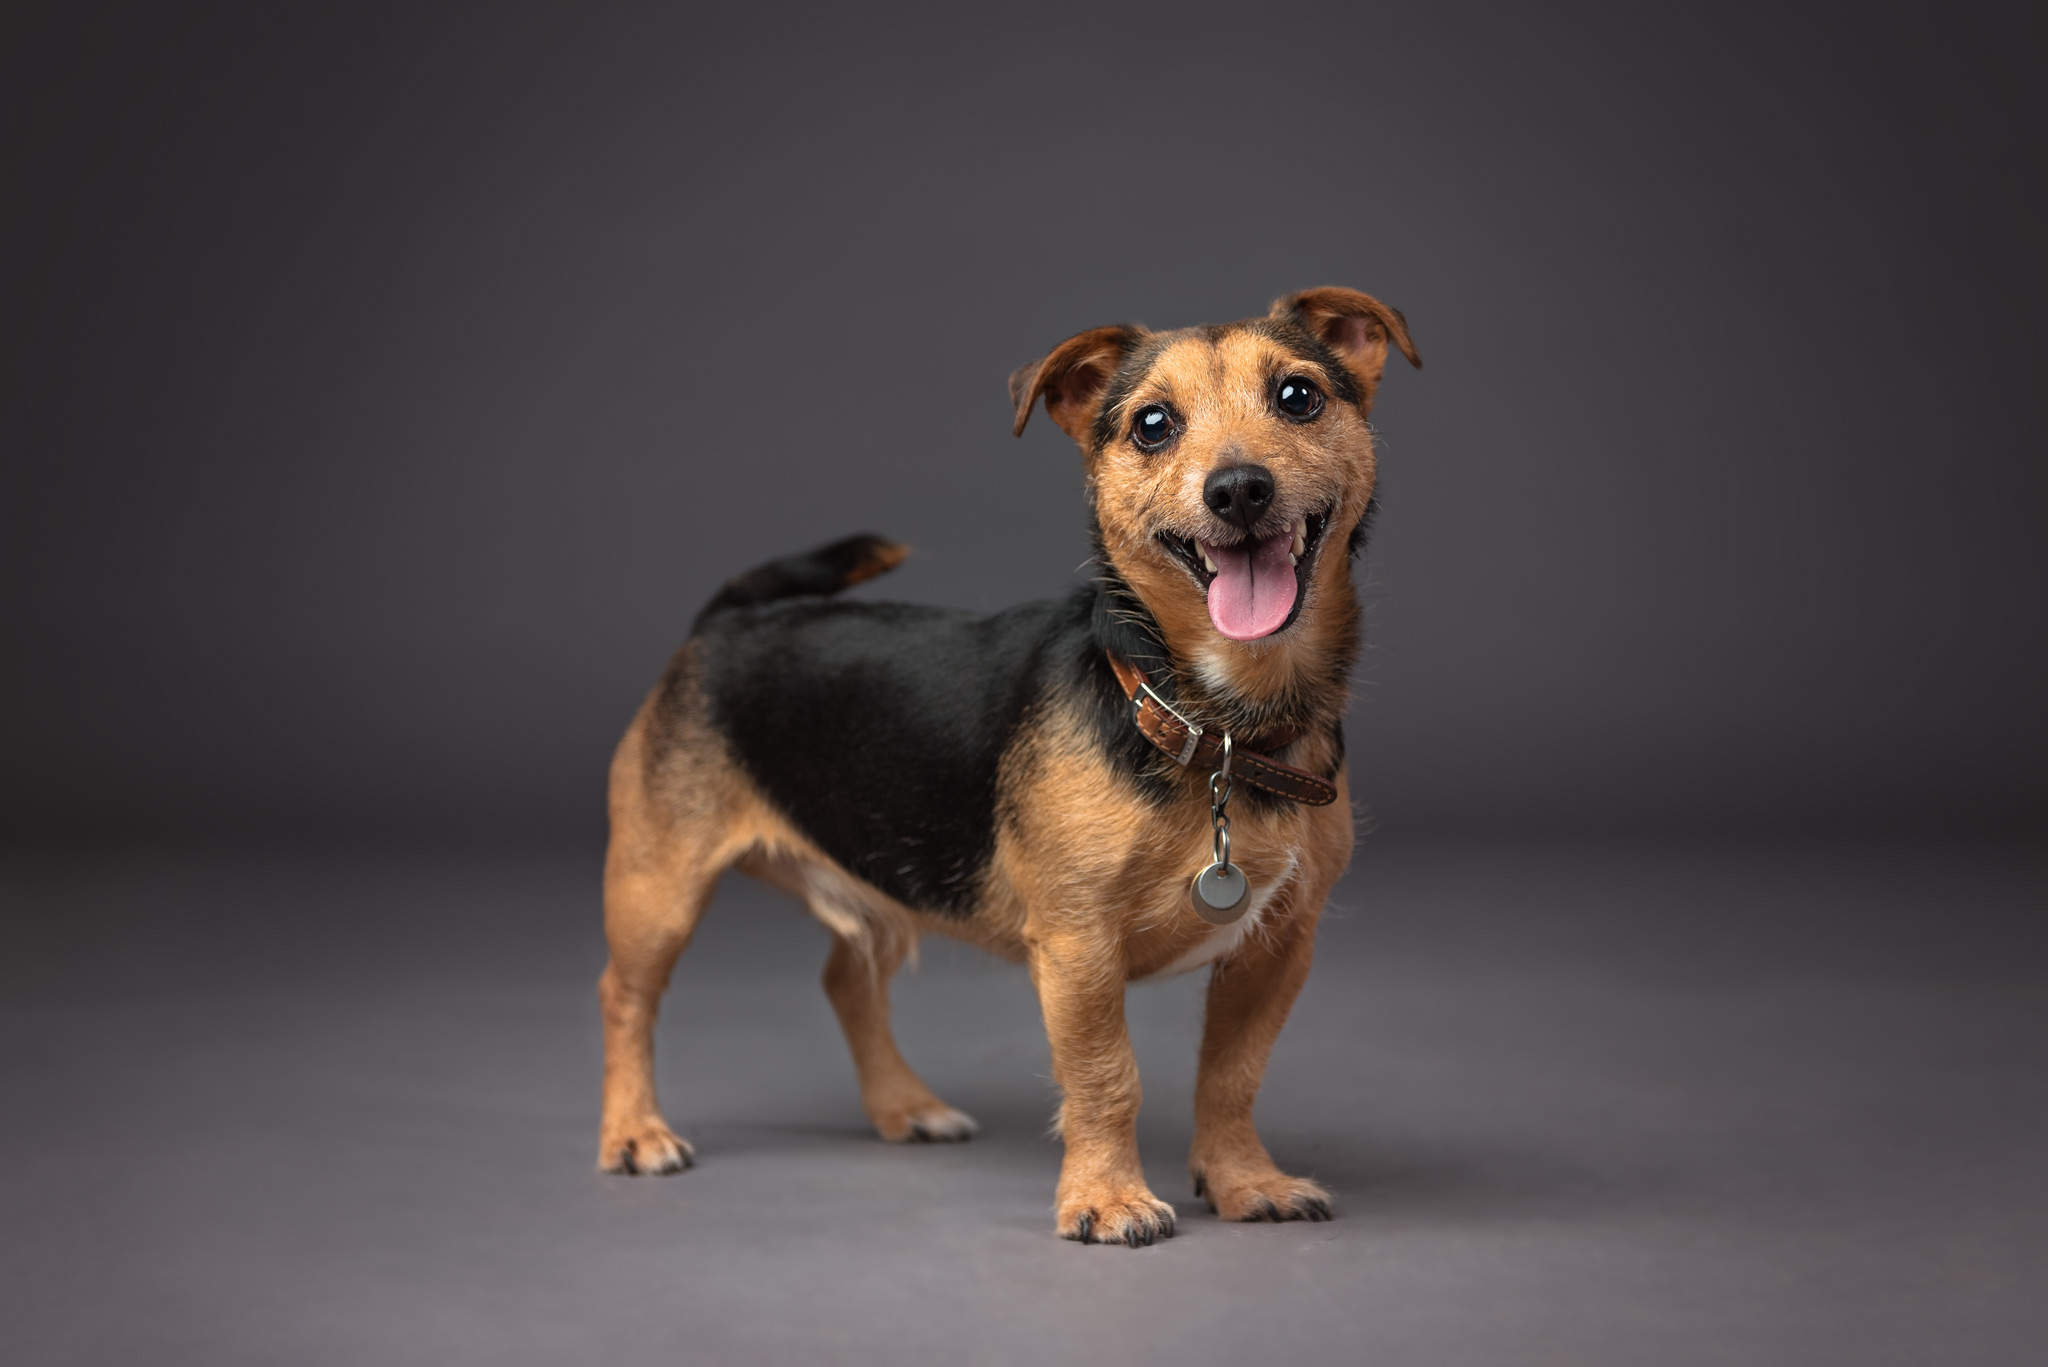 Jack Russell terrier in the studio